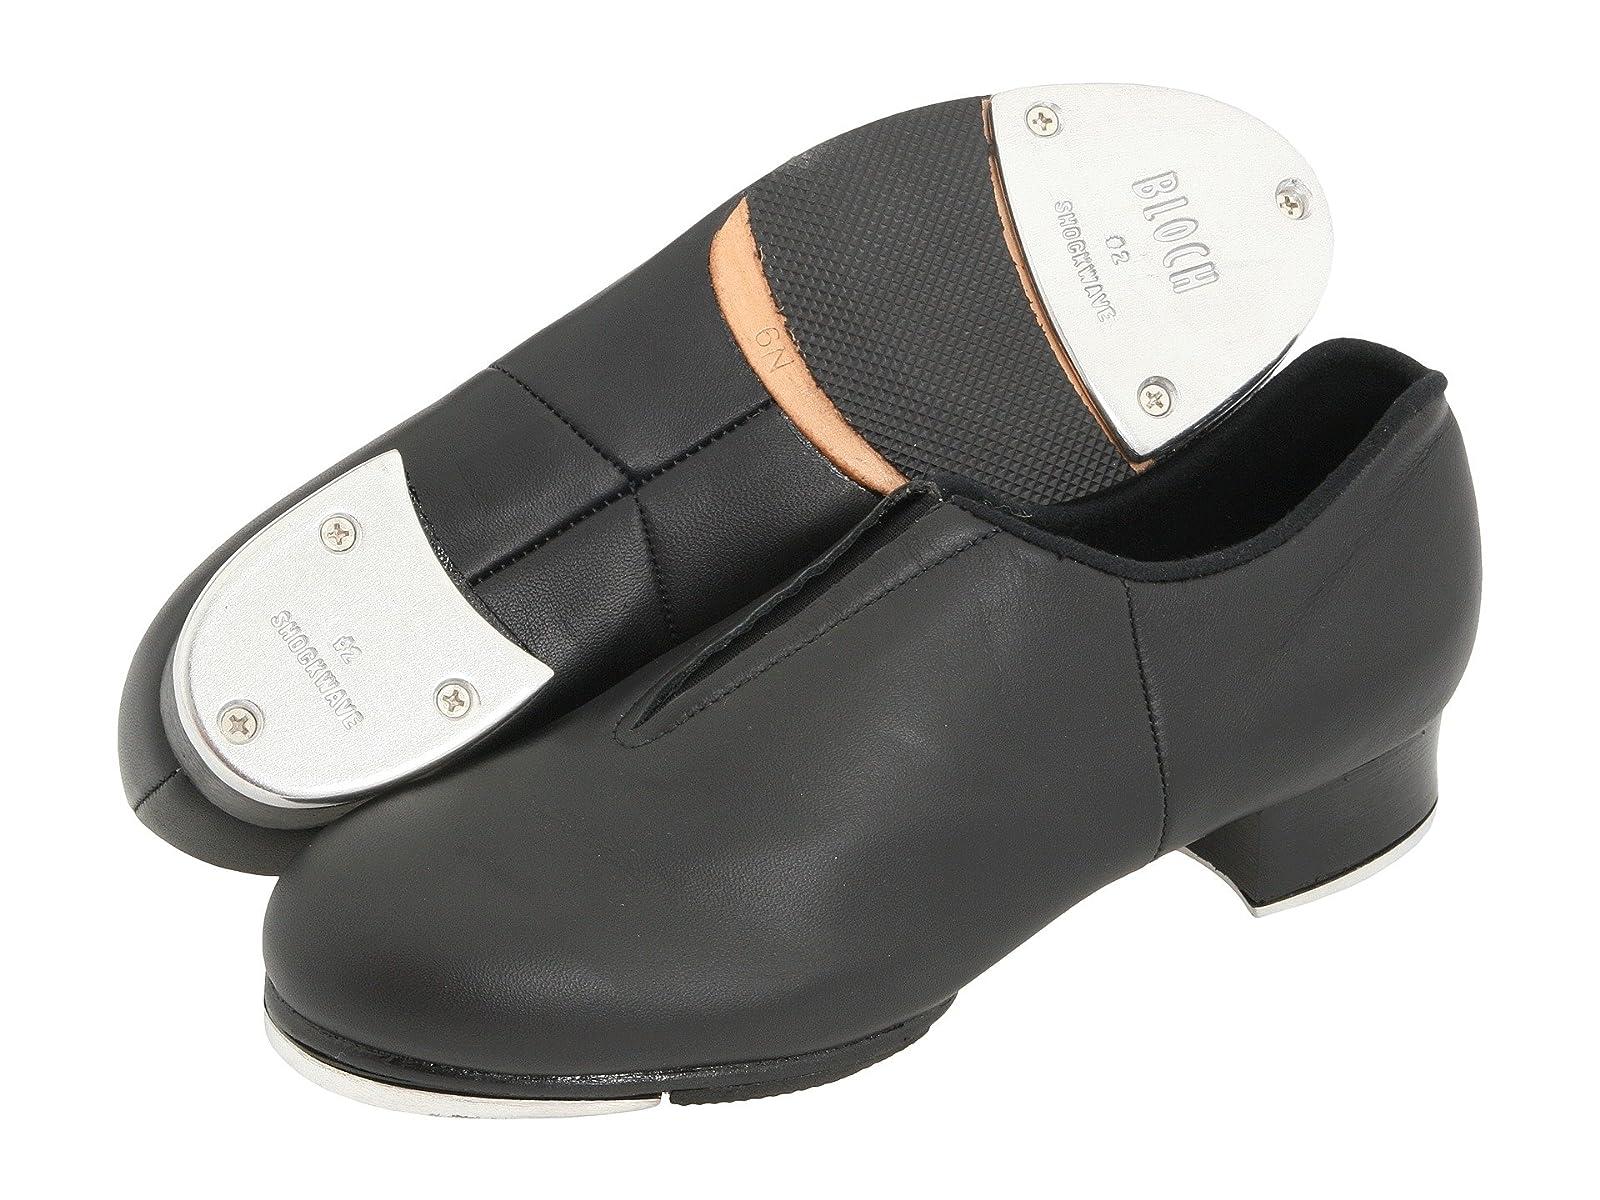 Bloch Tap-Flex Slip OnAtmospheric grades have affordable shoes